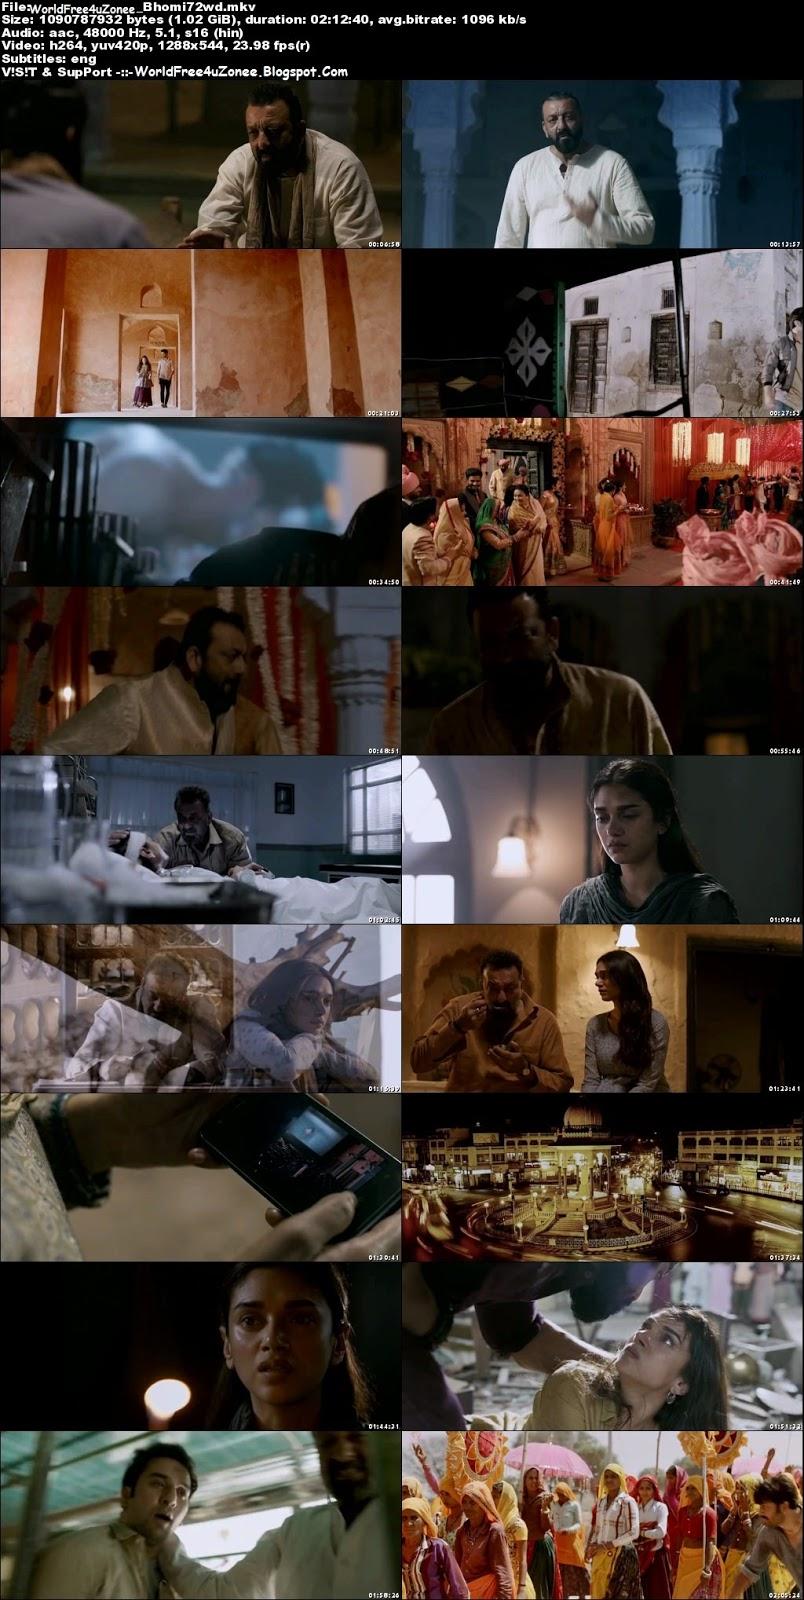 Bhoomi (2017) Hindi HDRip 720p 1GB Full Movie Free Download And Watch Online Latest Bollywood Hindi New Movies 2017 Free At WorldFree4uZonee.Blogspot.Com